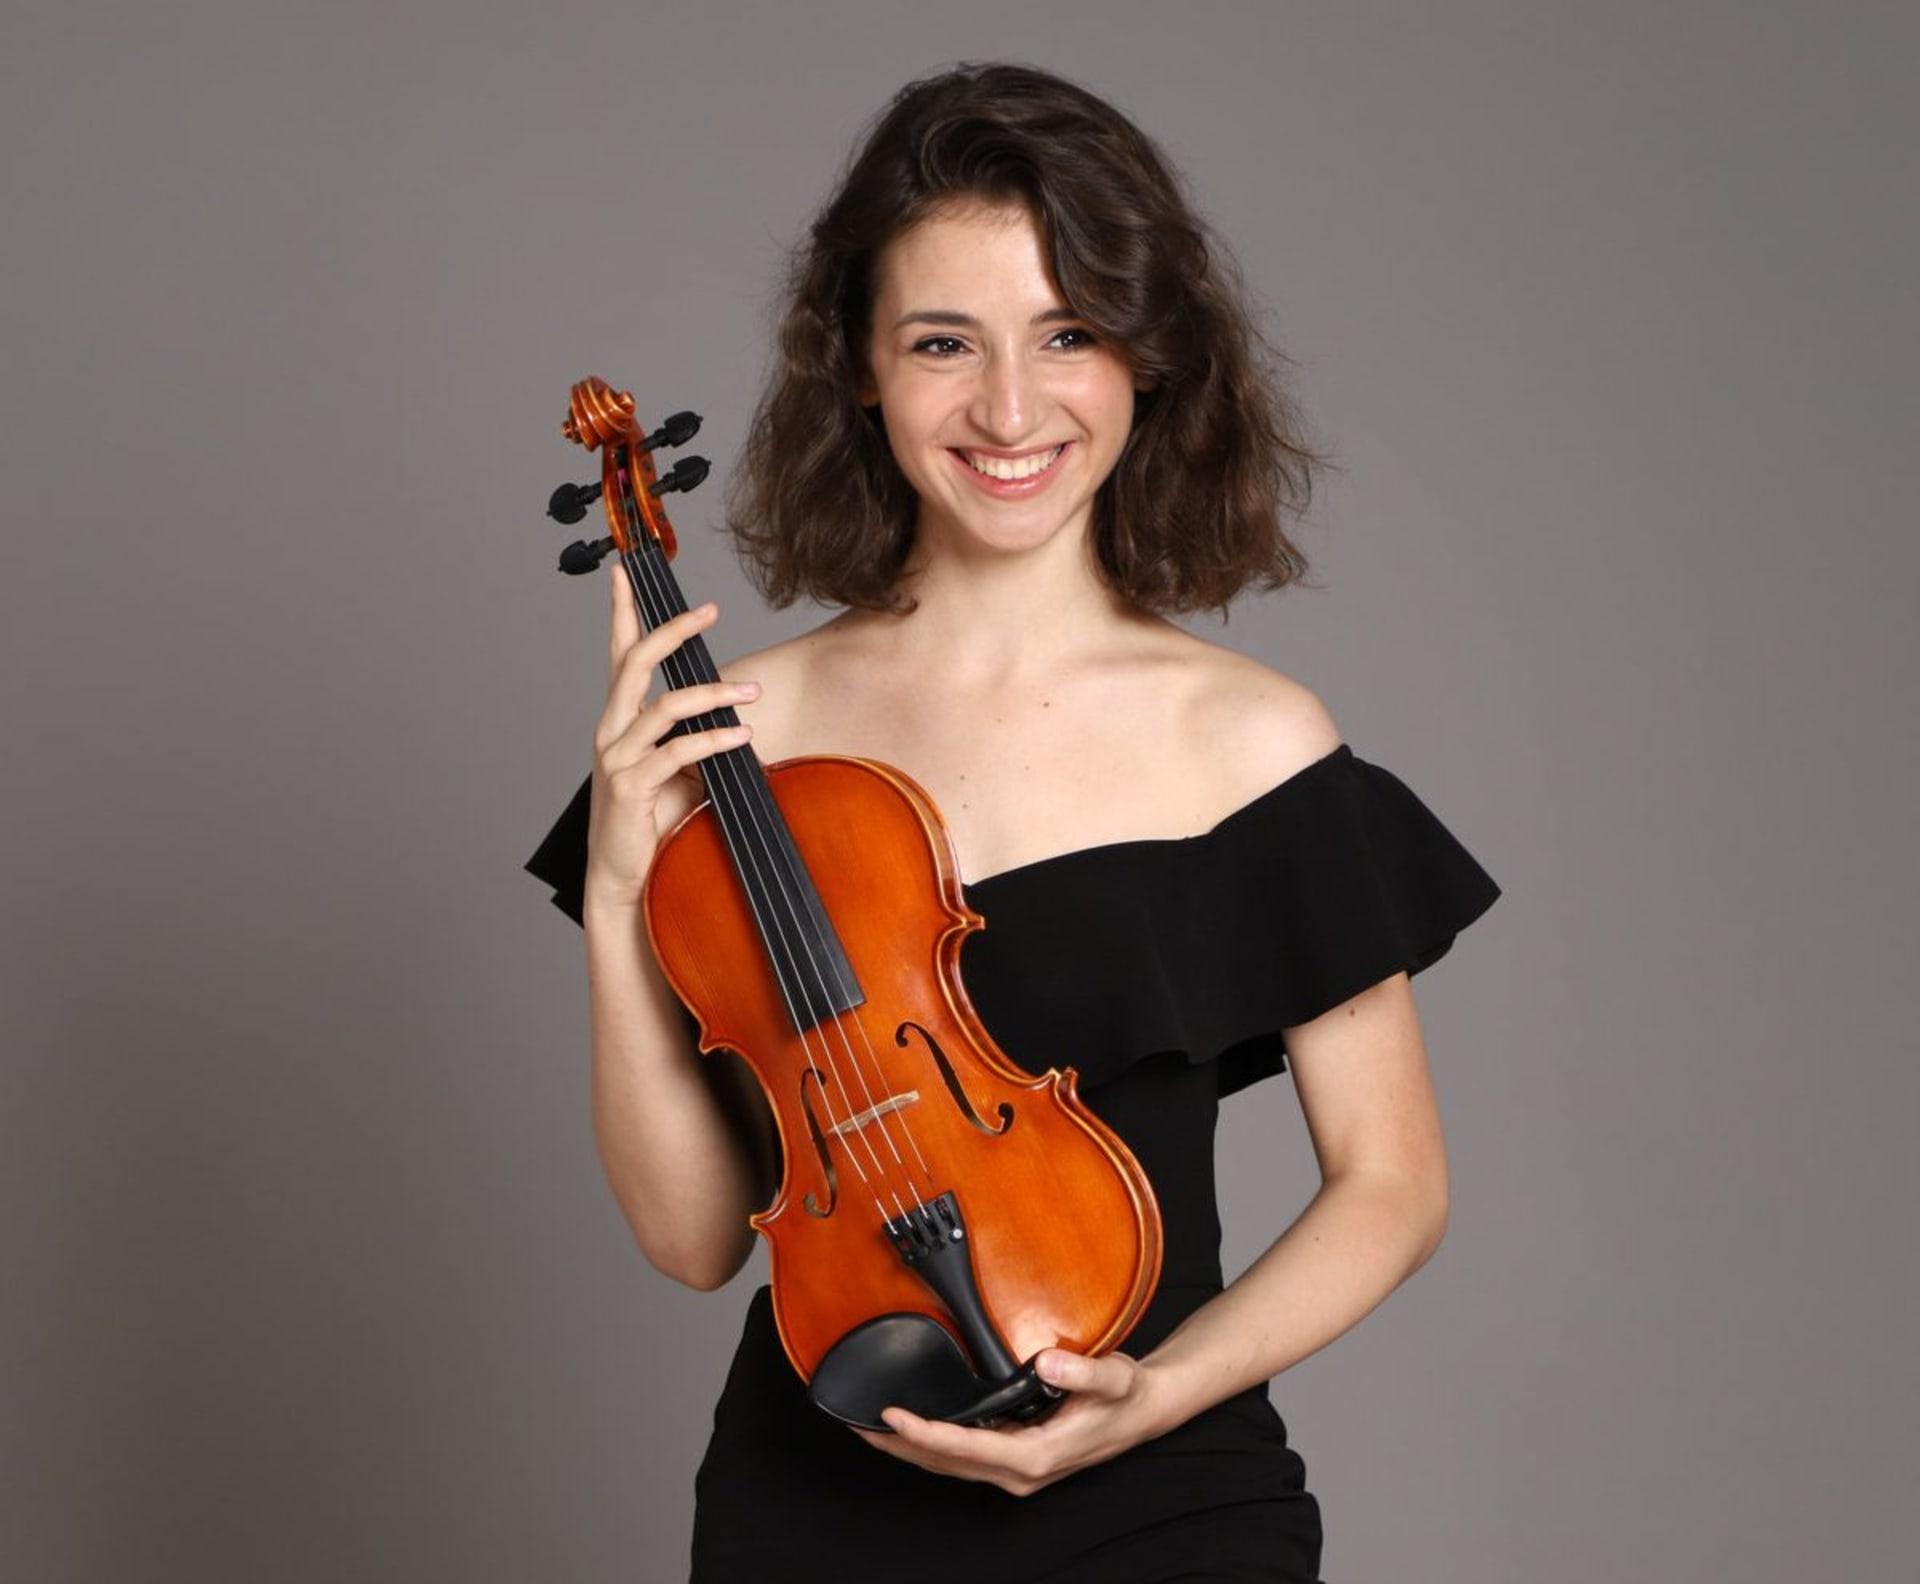 Ioana Șelaru